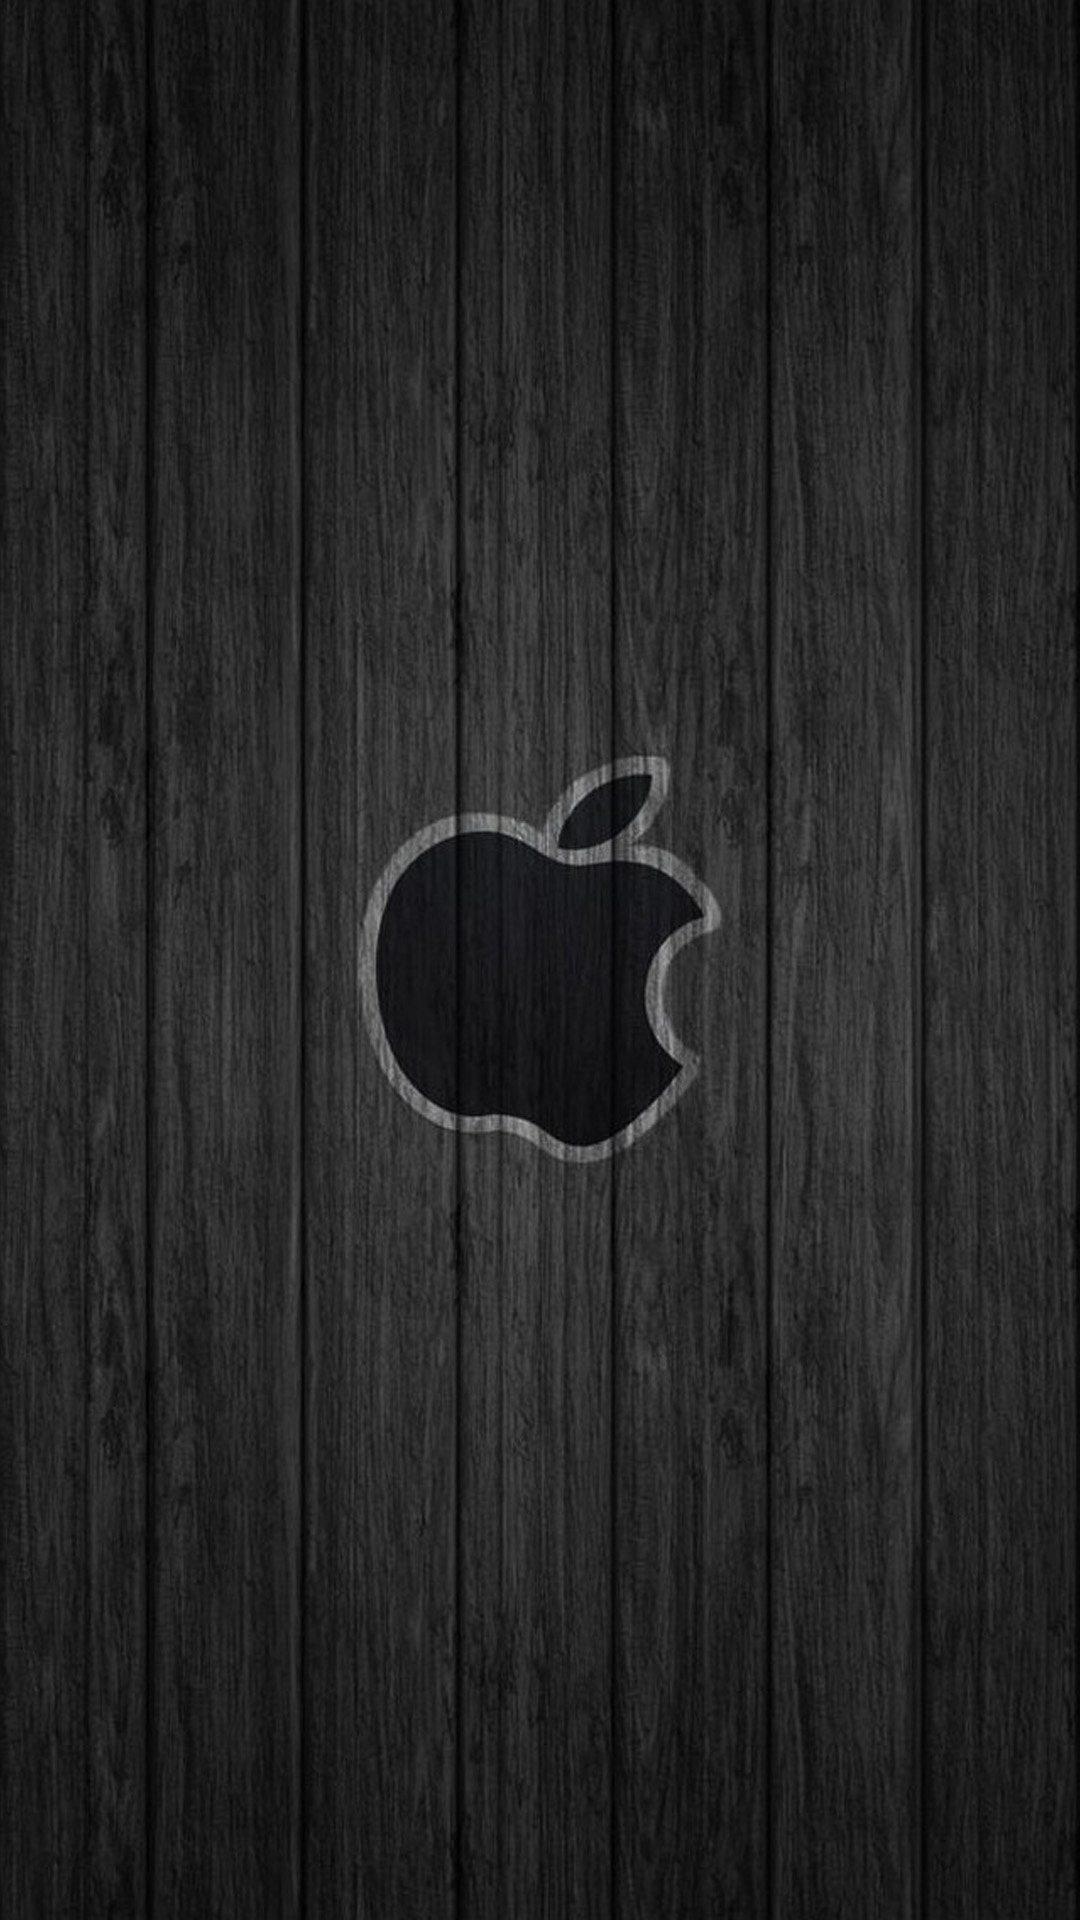 bdeabbcfebdb-iphone-apple-logo-wallpaper-wp5005093